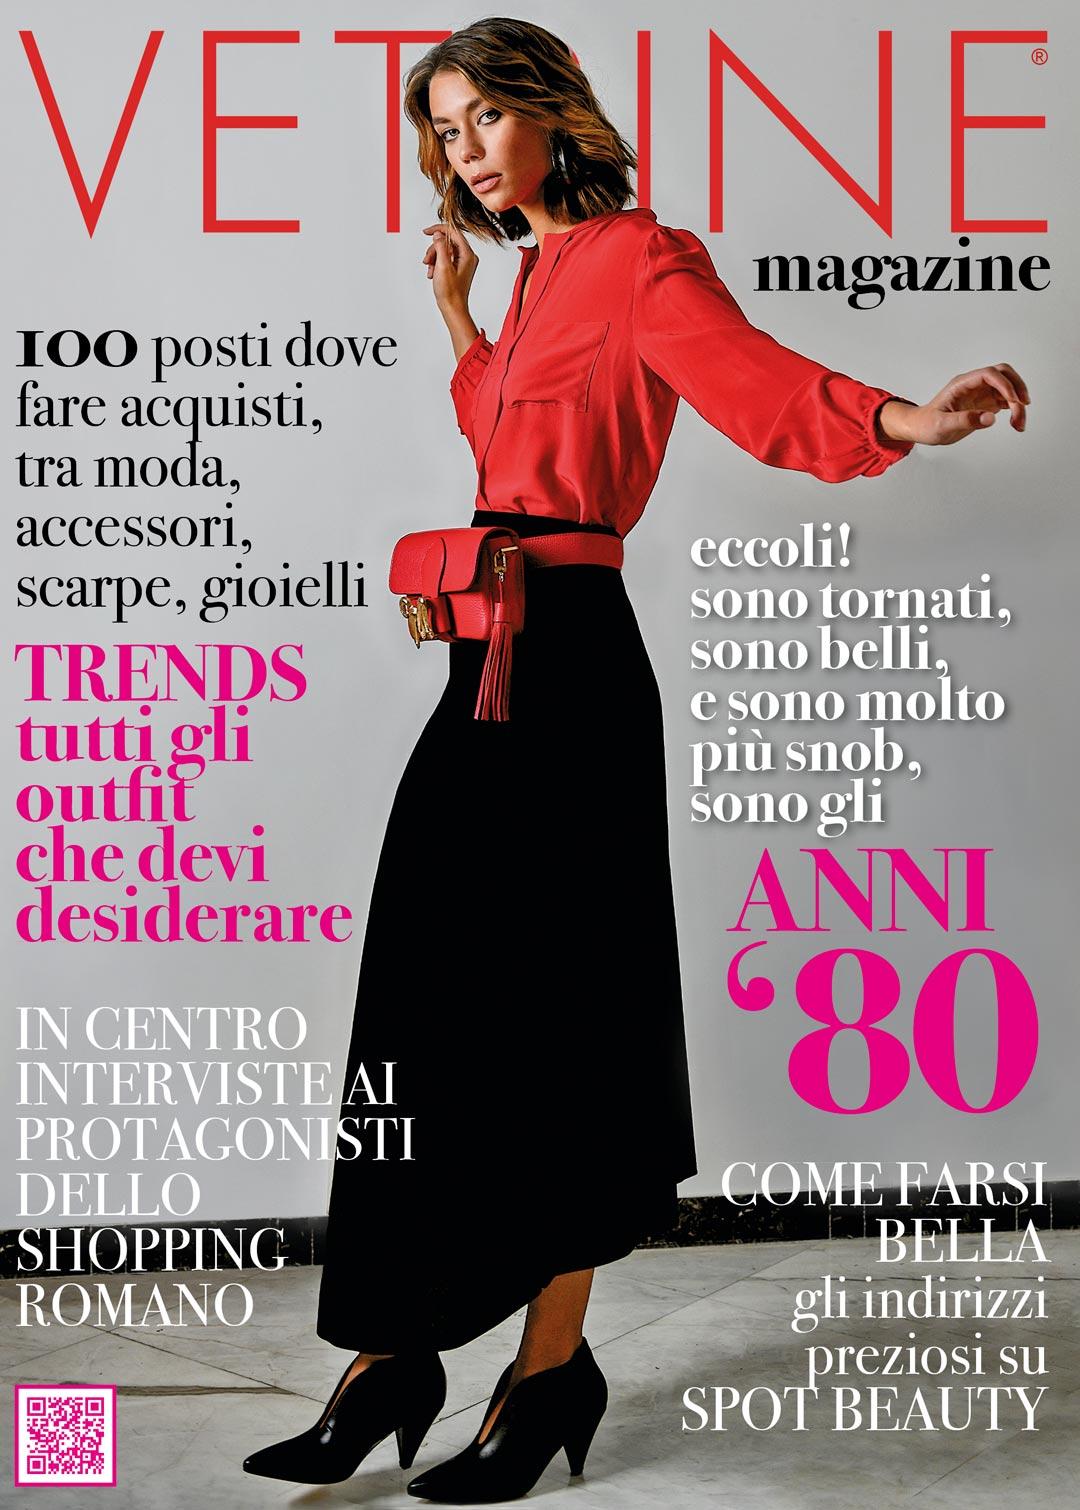 Vetrine Magazine